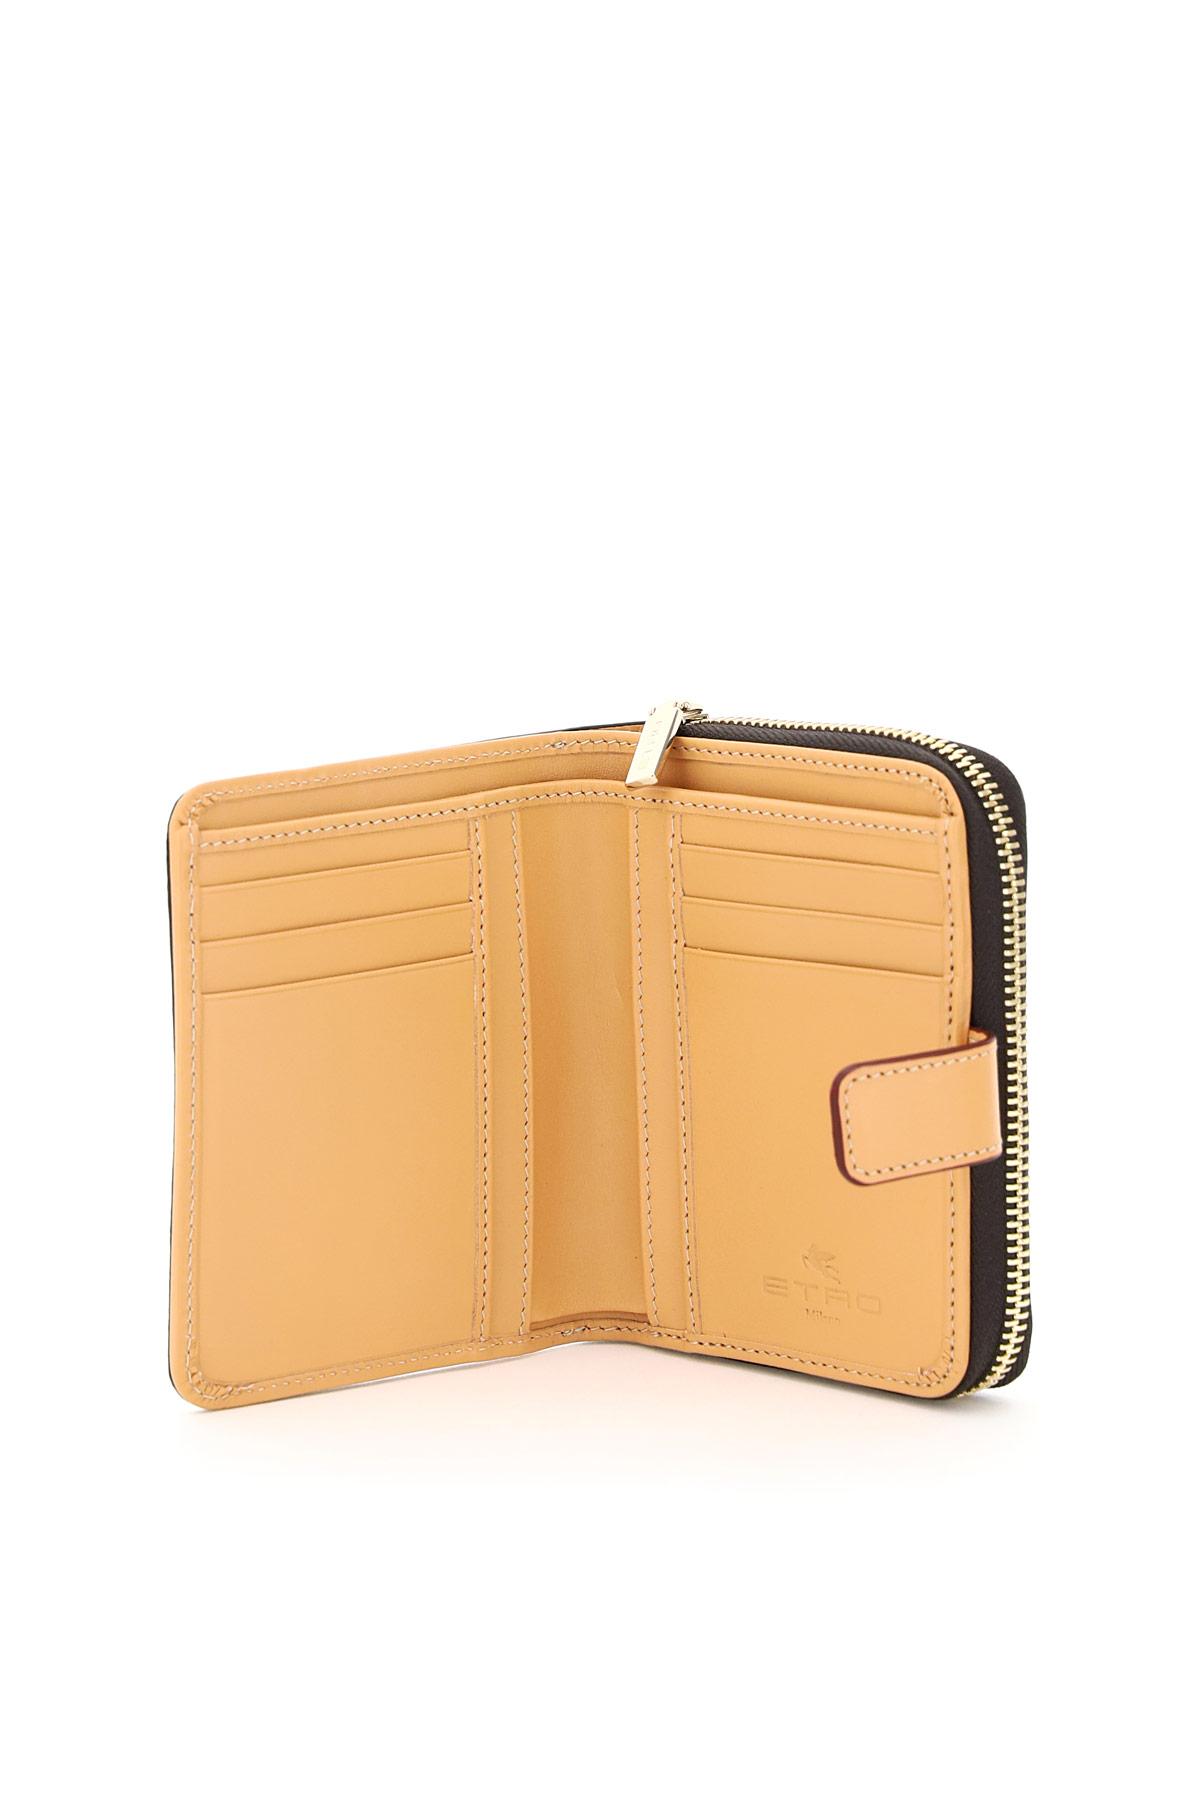 Etro portafoglio paisley